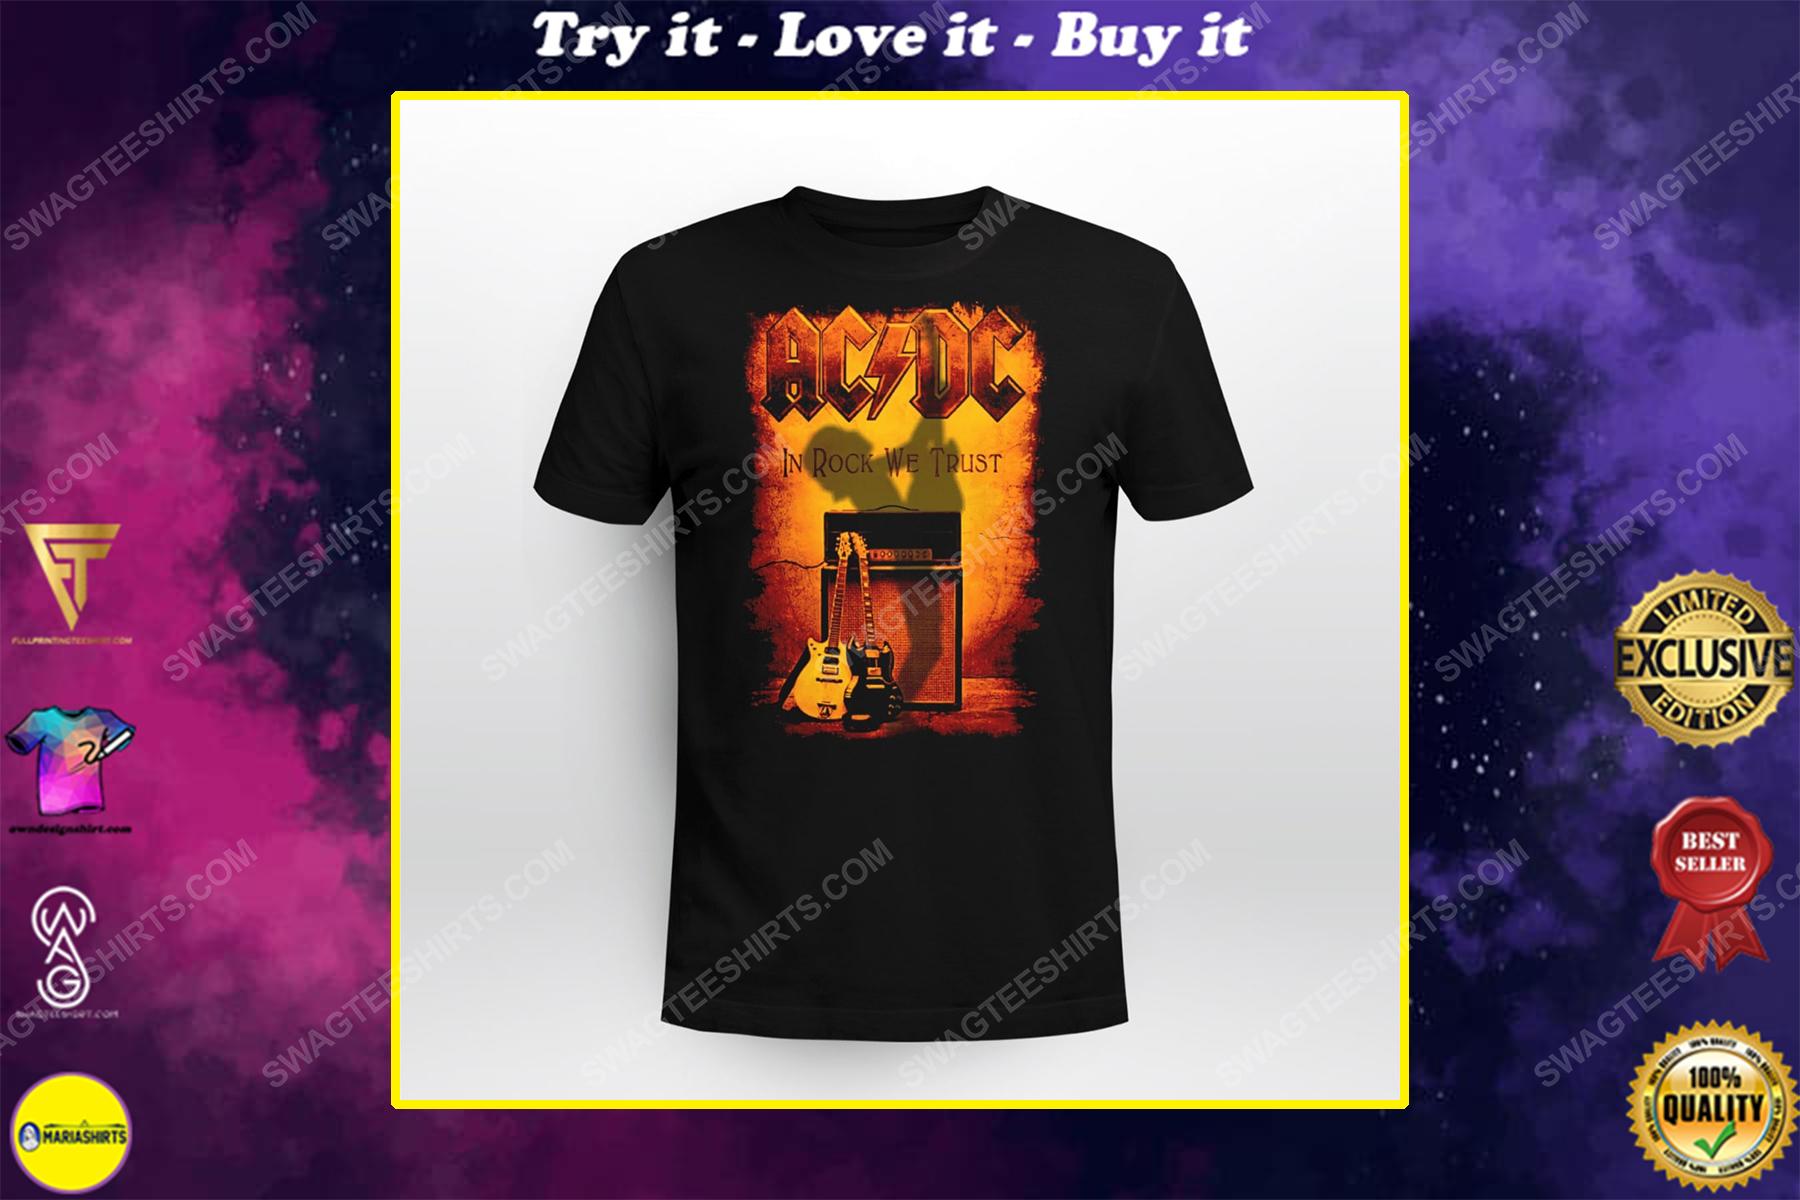 Rock band ac dc in rock we trust shirt